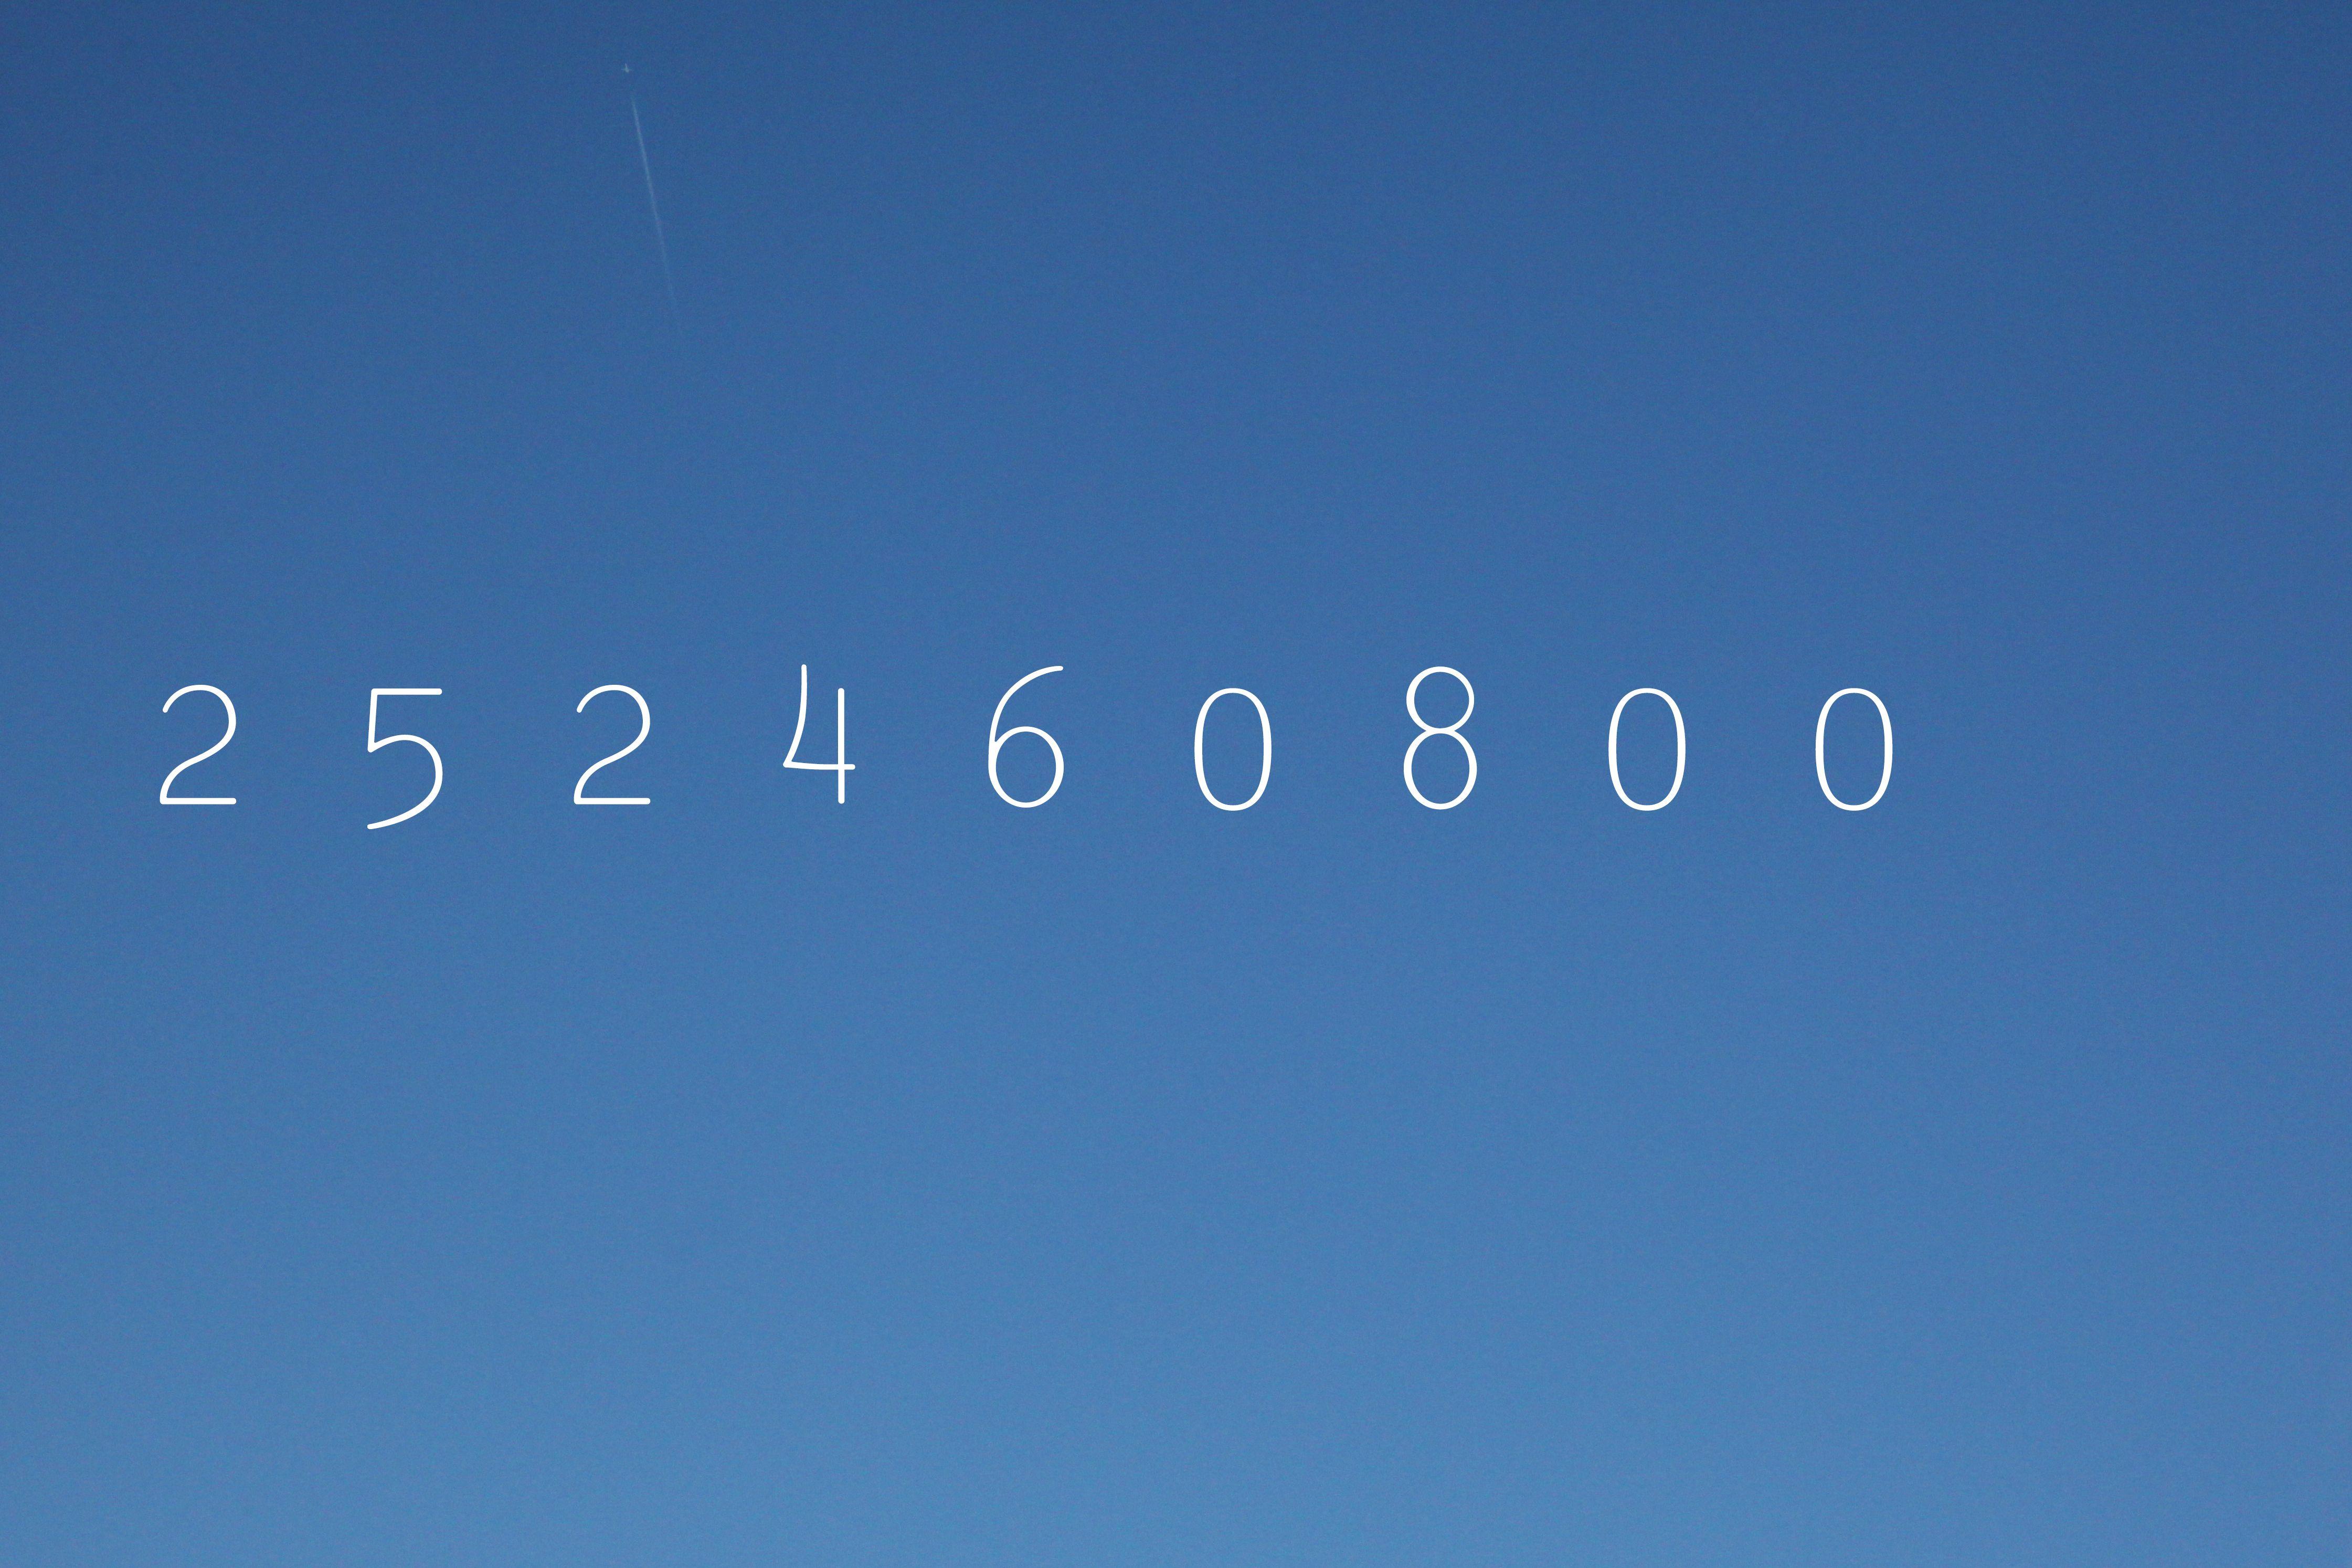 Leap Second, 31 December 1977 - 23:59:60